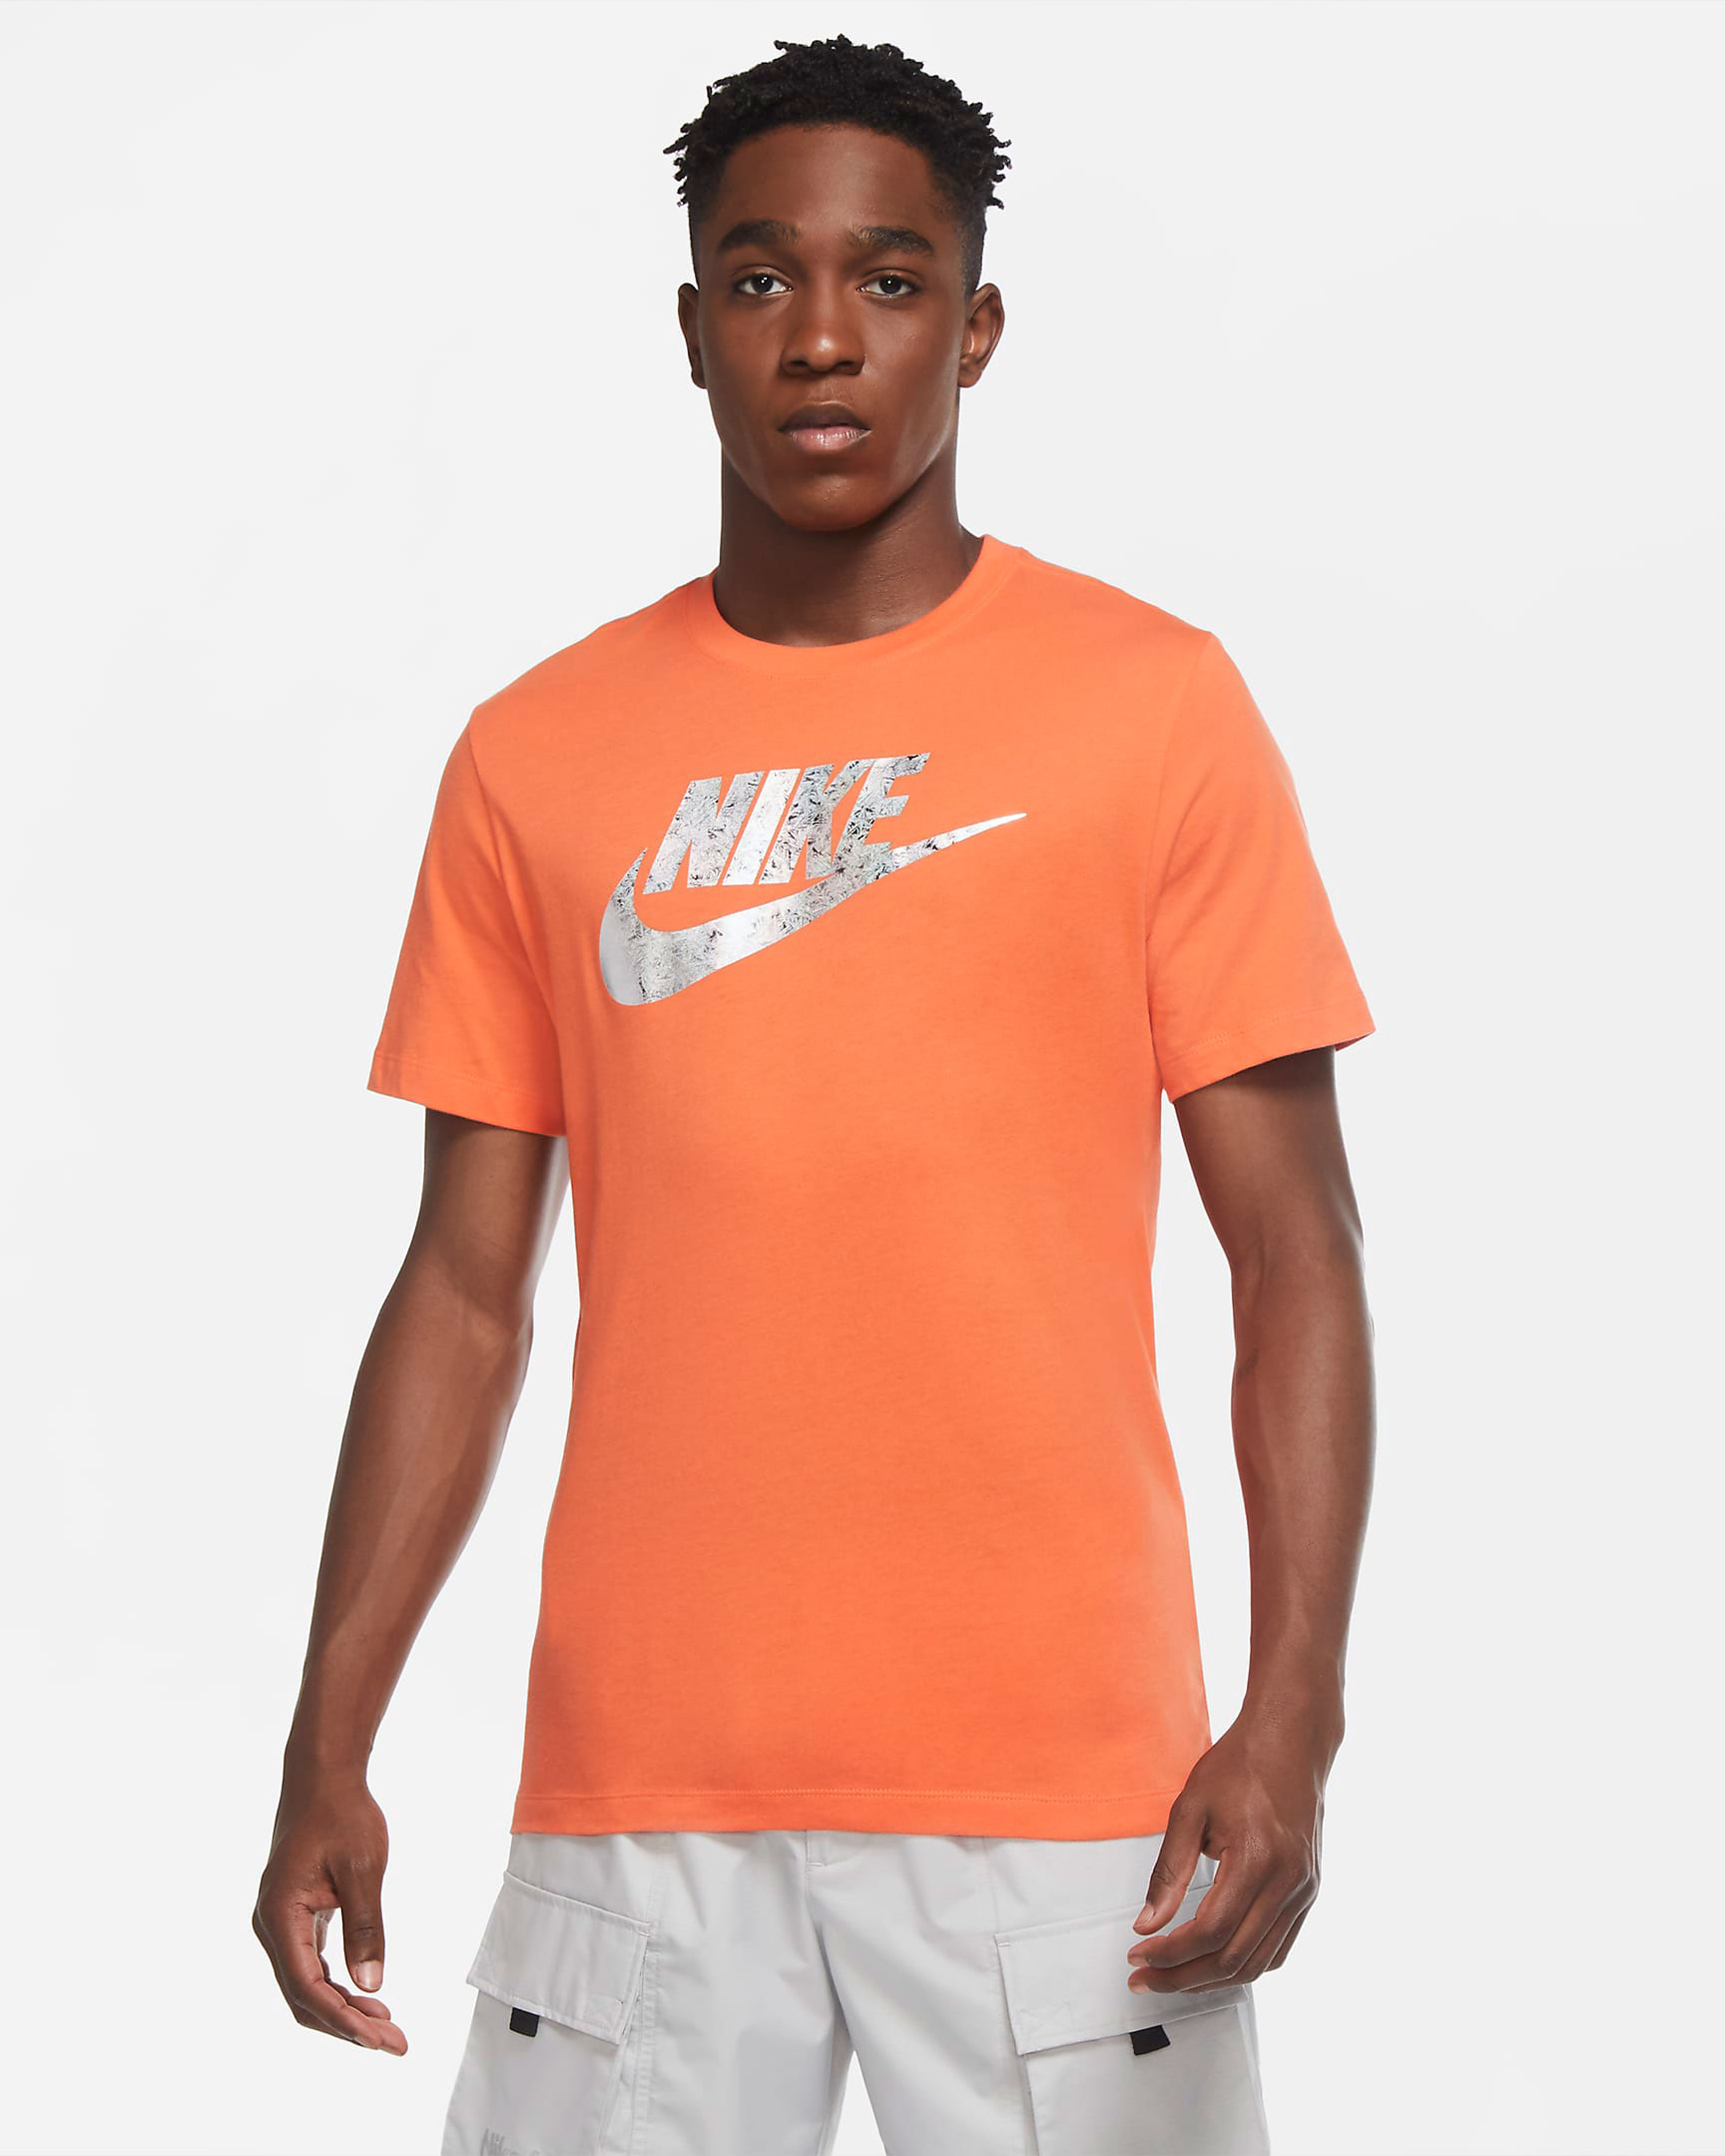 nike-foamposite-halloween-shirt-orange-silver-1